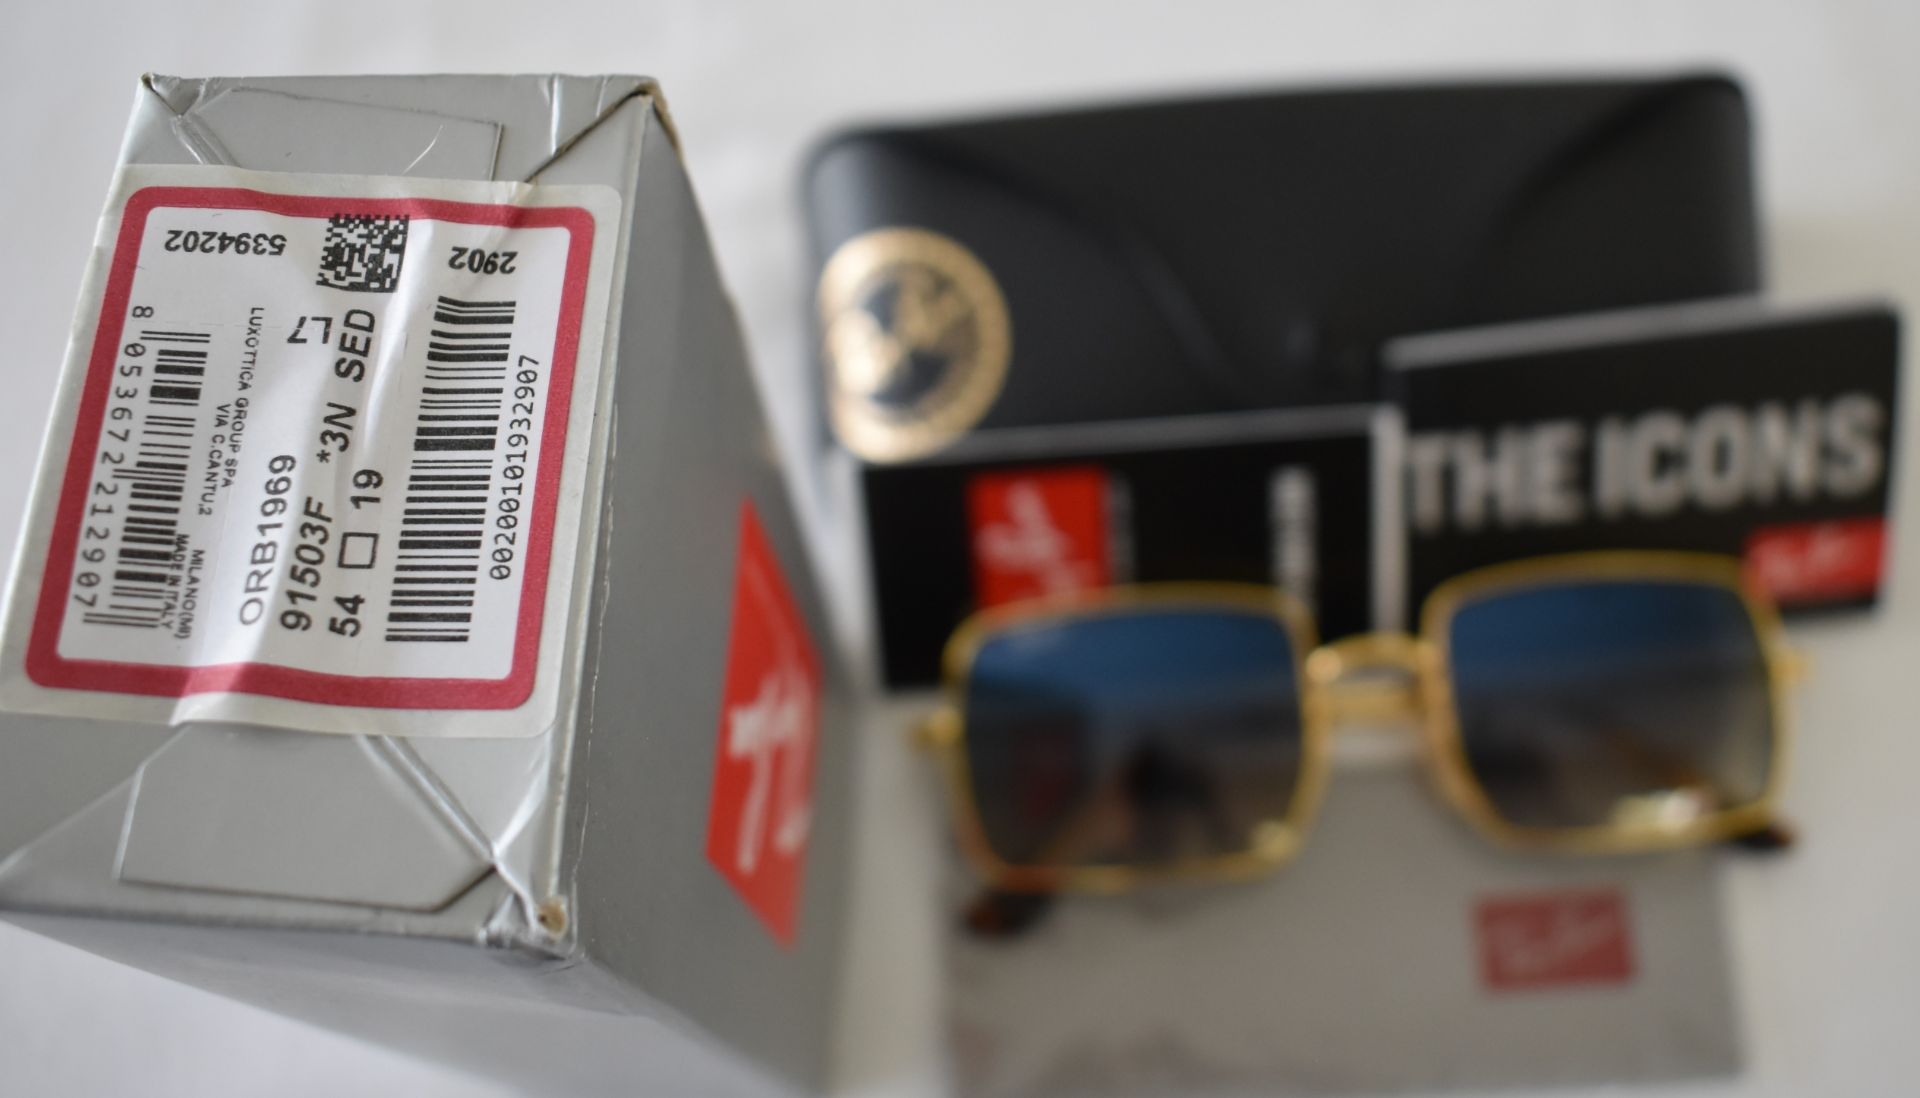 Ray Ban Sunglasses ORB1969 91503F *3N - Image 3 of 3